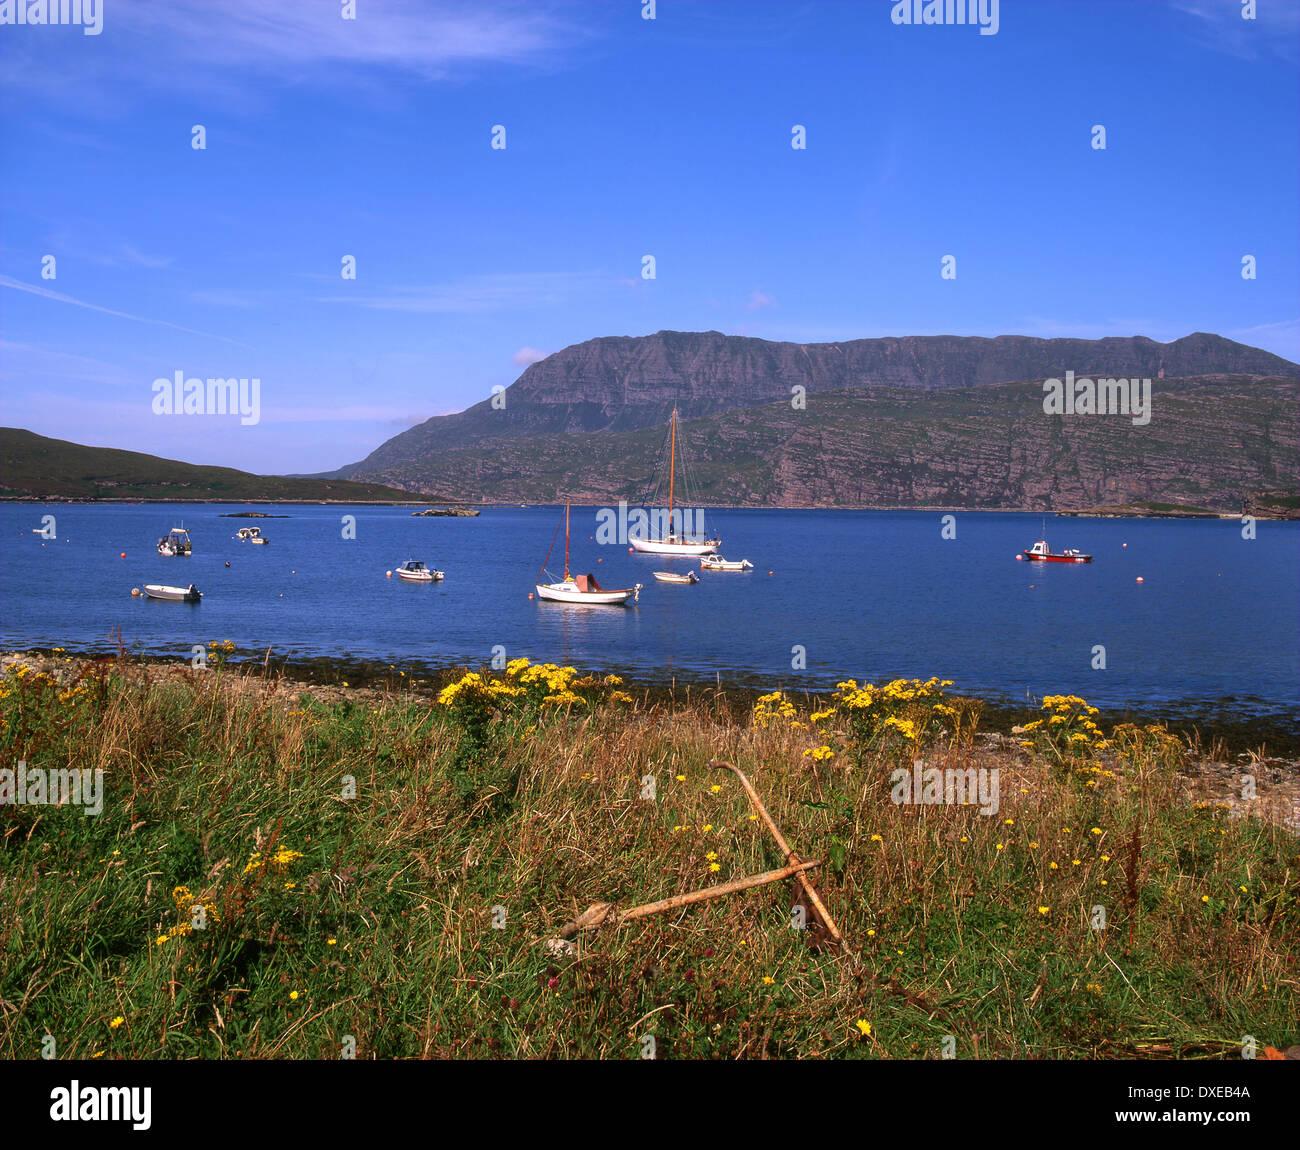 Summer view across Ardmair bay towards Ben More Coigach,West Ross,North west highlands.scotland. - Stock Image